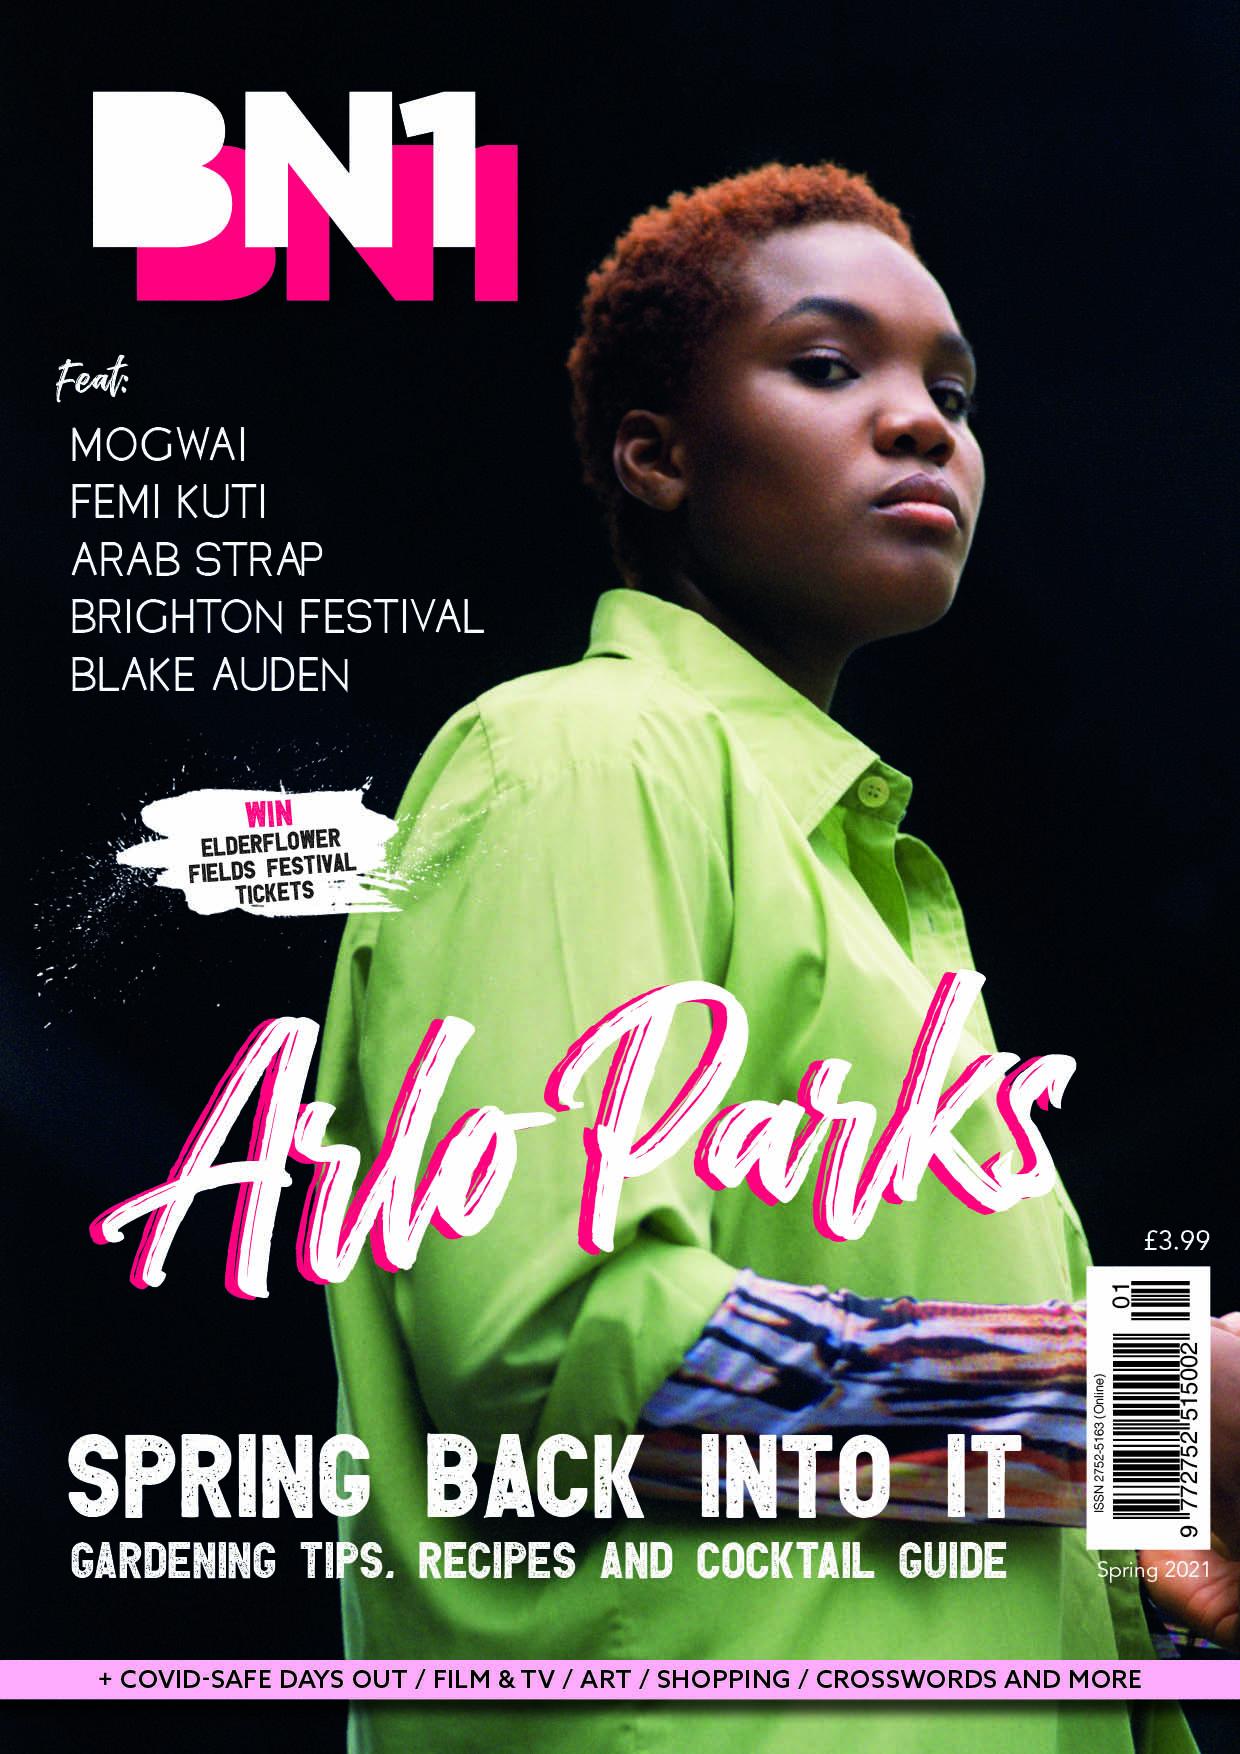 BN1 Magazine Spring edition